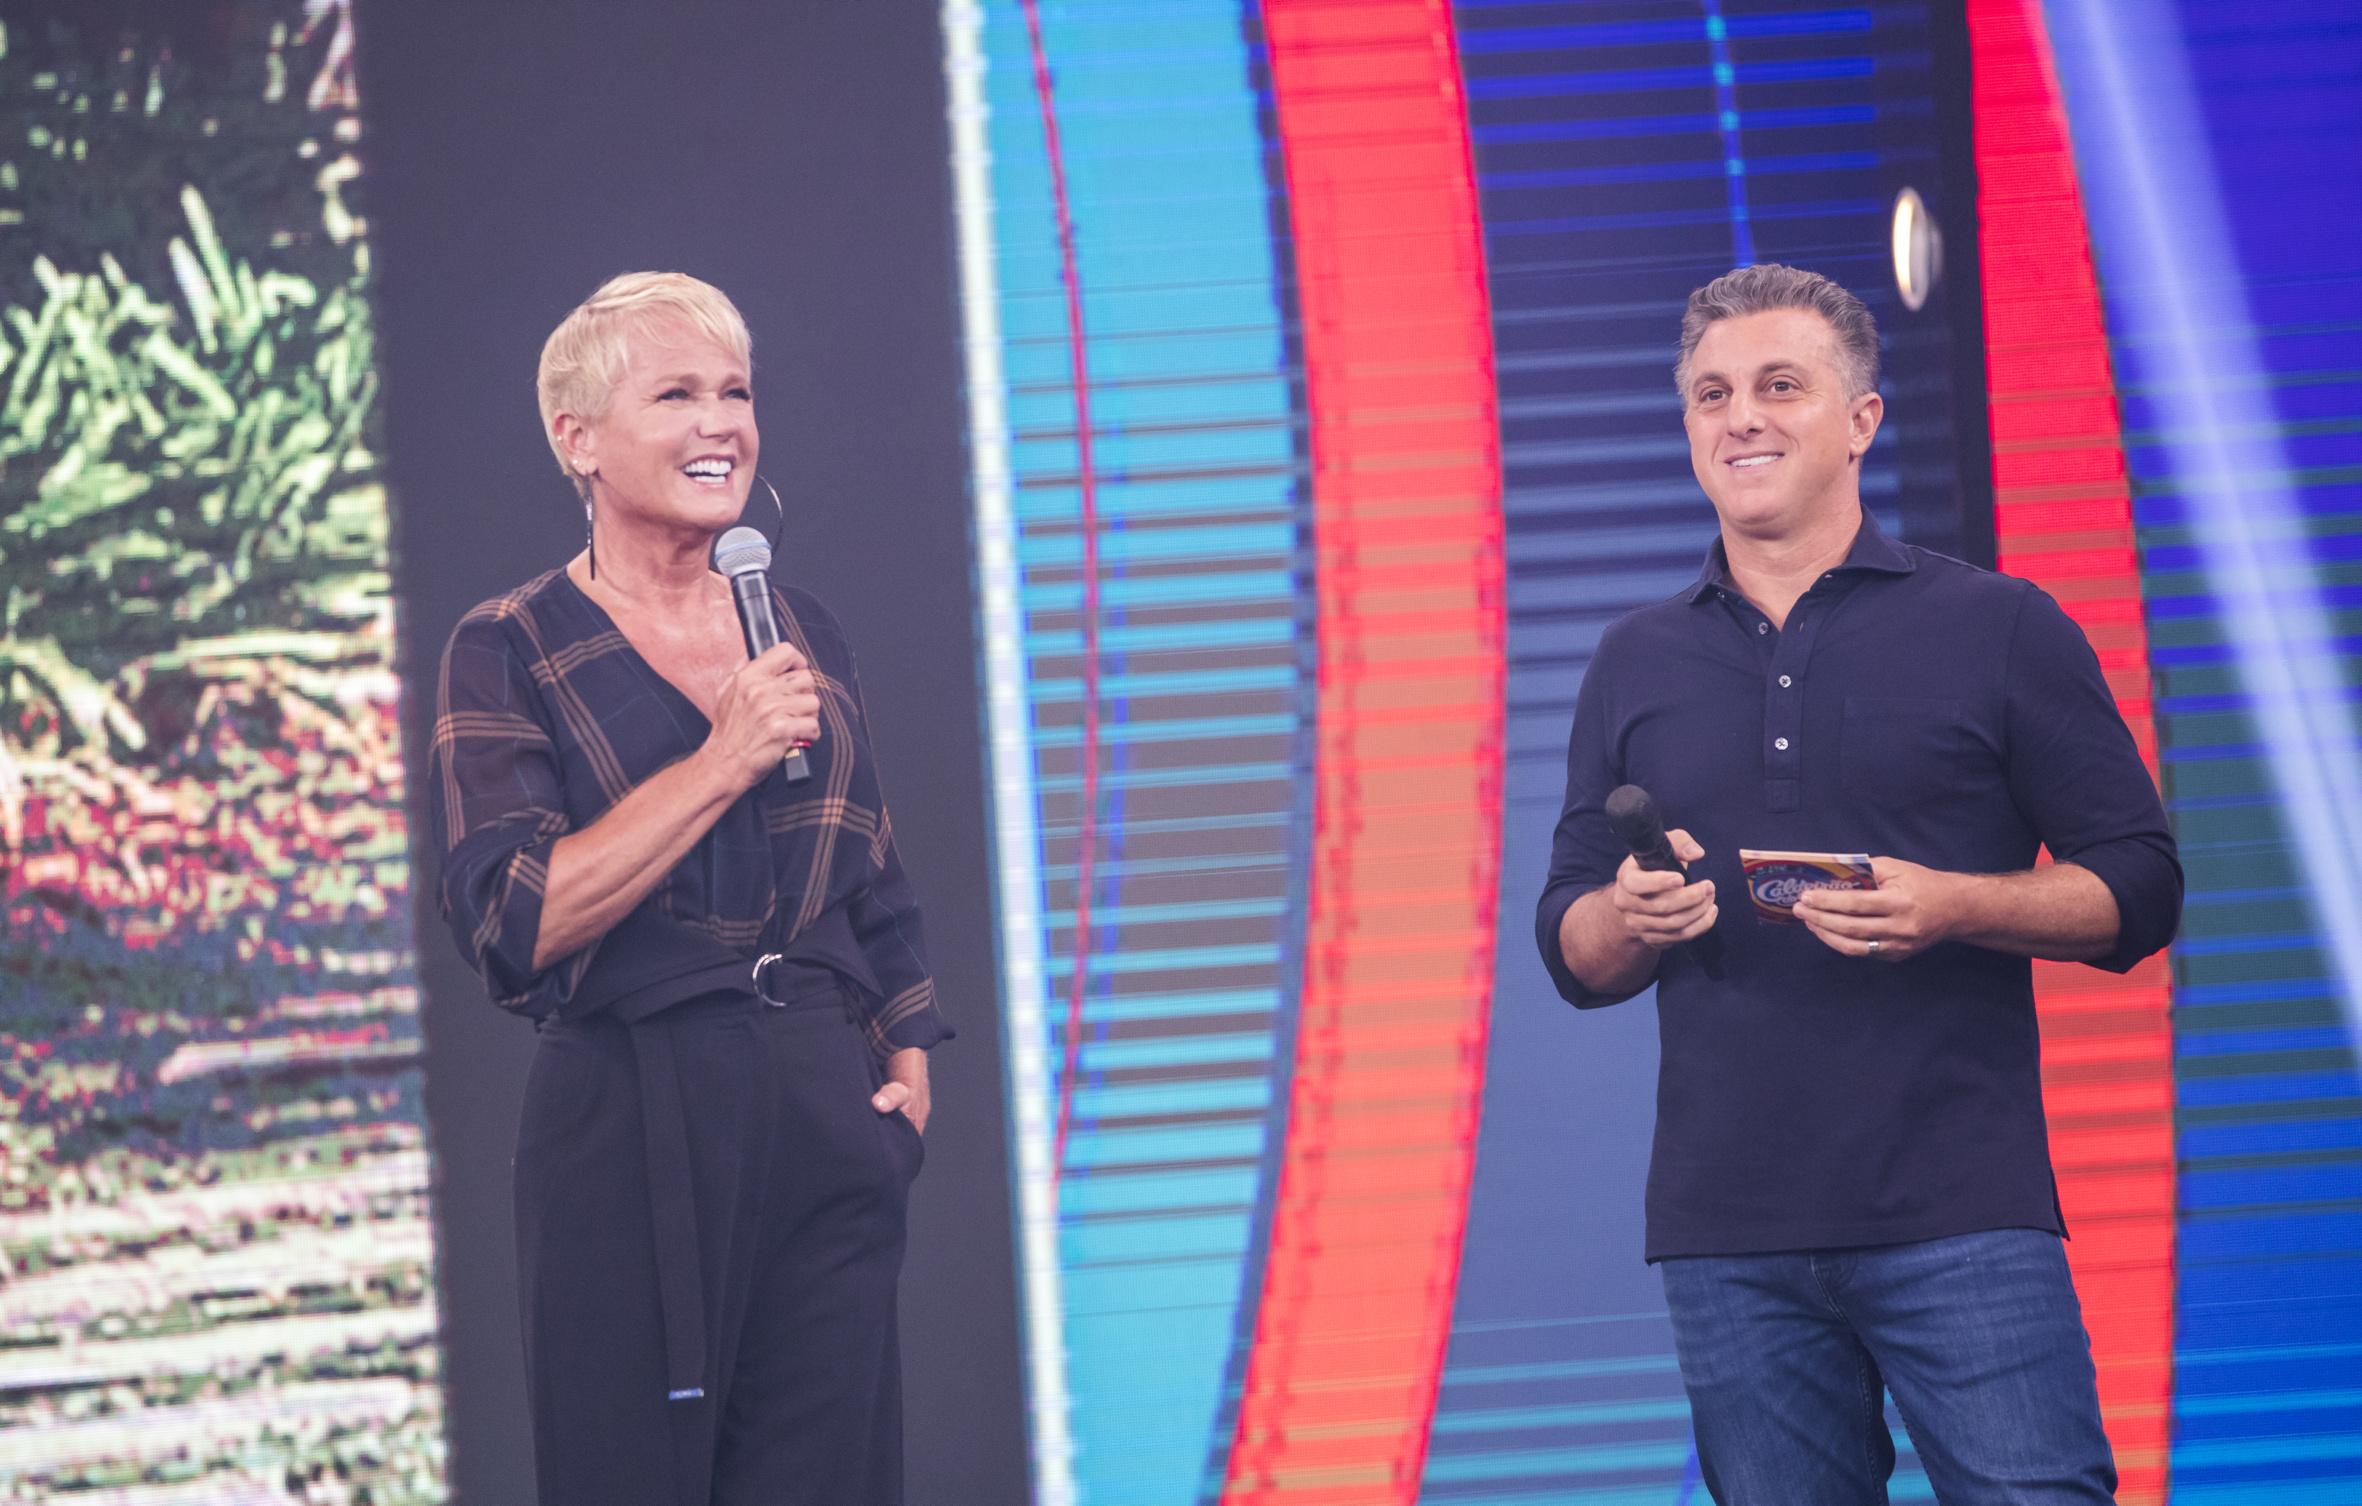 Xuxa Meneghel e Luciano Huck / João Miguel Jr-RG